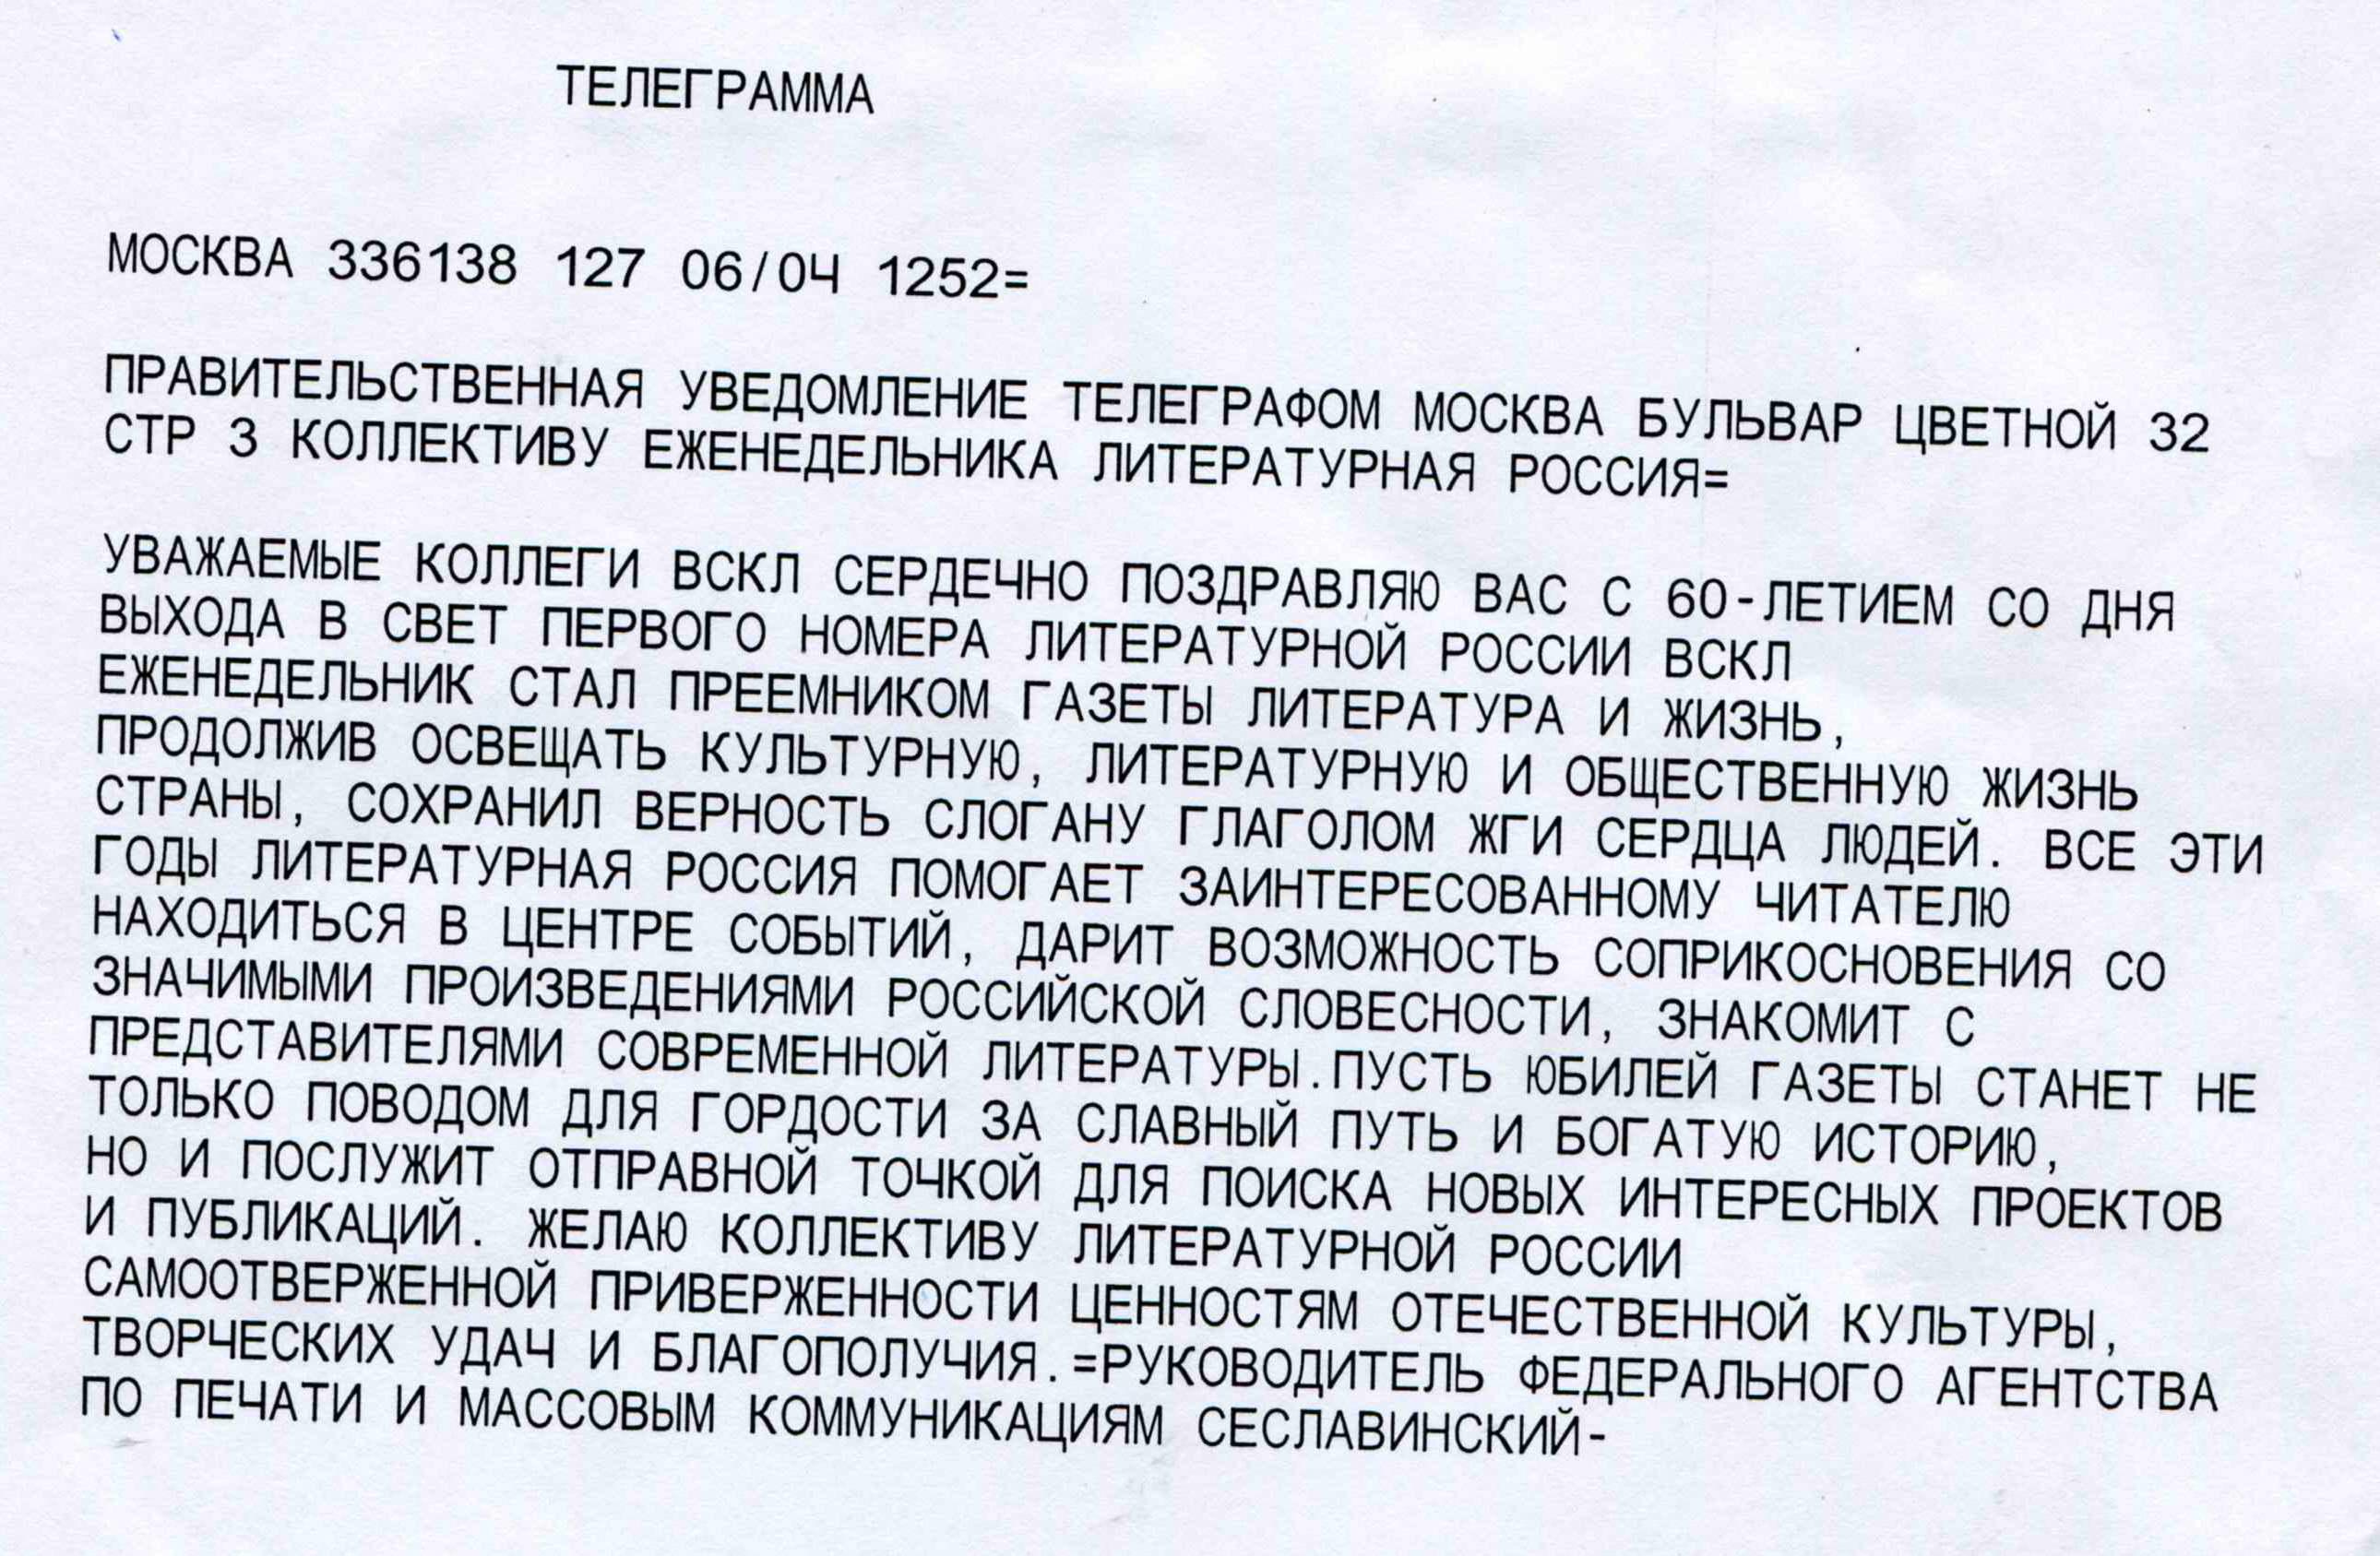 01 telegramma ot Seslavinskogo01